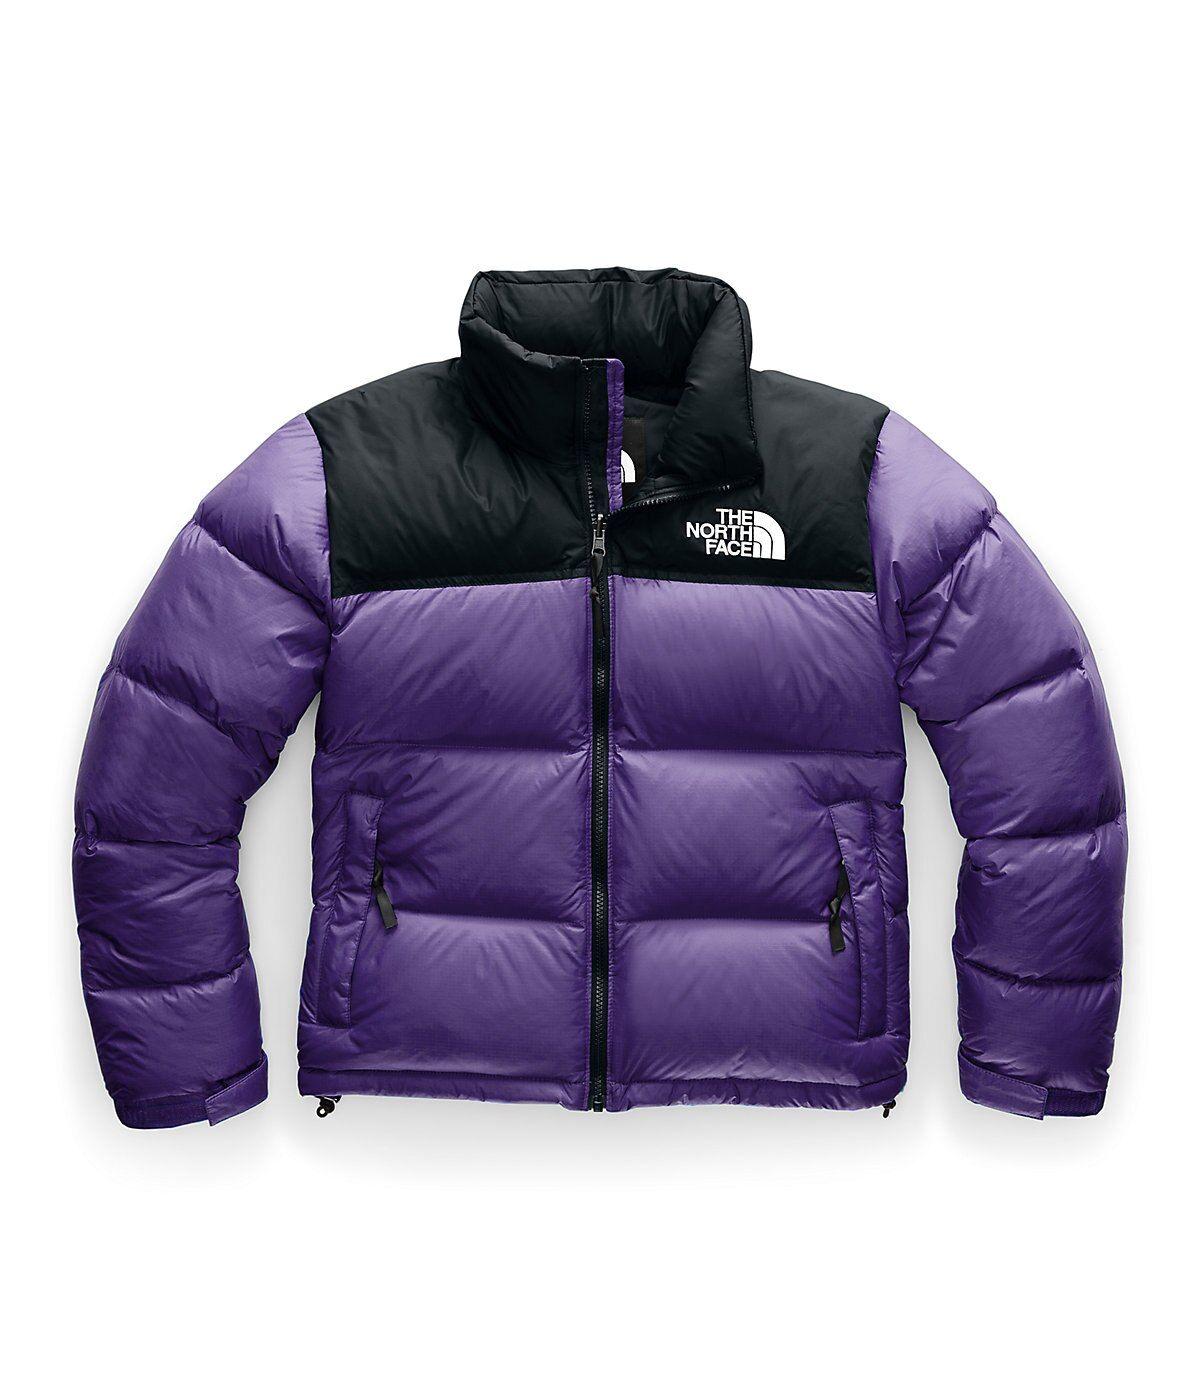 Women S 1996 Retro Nuptse Jacket The North Face In 2021 Retro Nuptse Jacket 1996 Retro Nuptse Jacket Jackets [ 1396 x 1200 Pixel ]